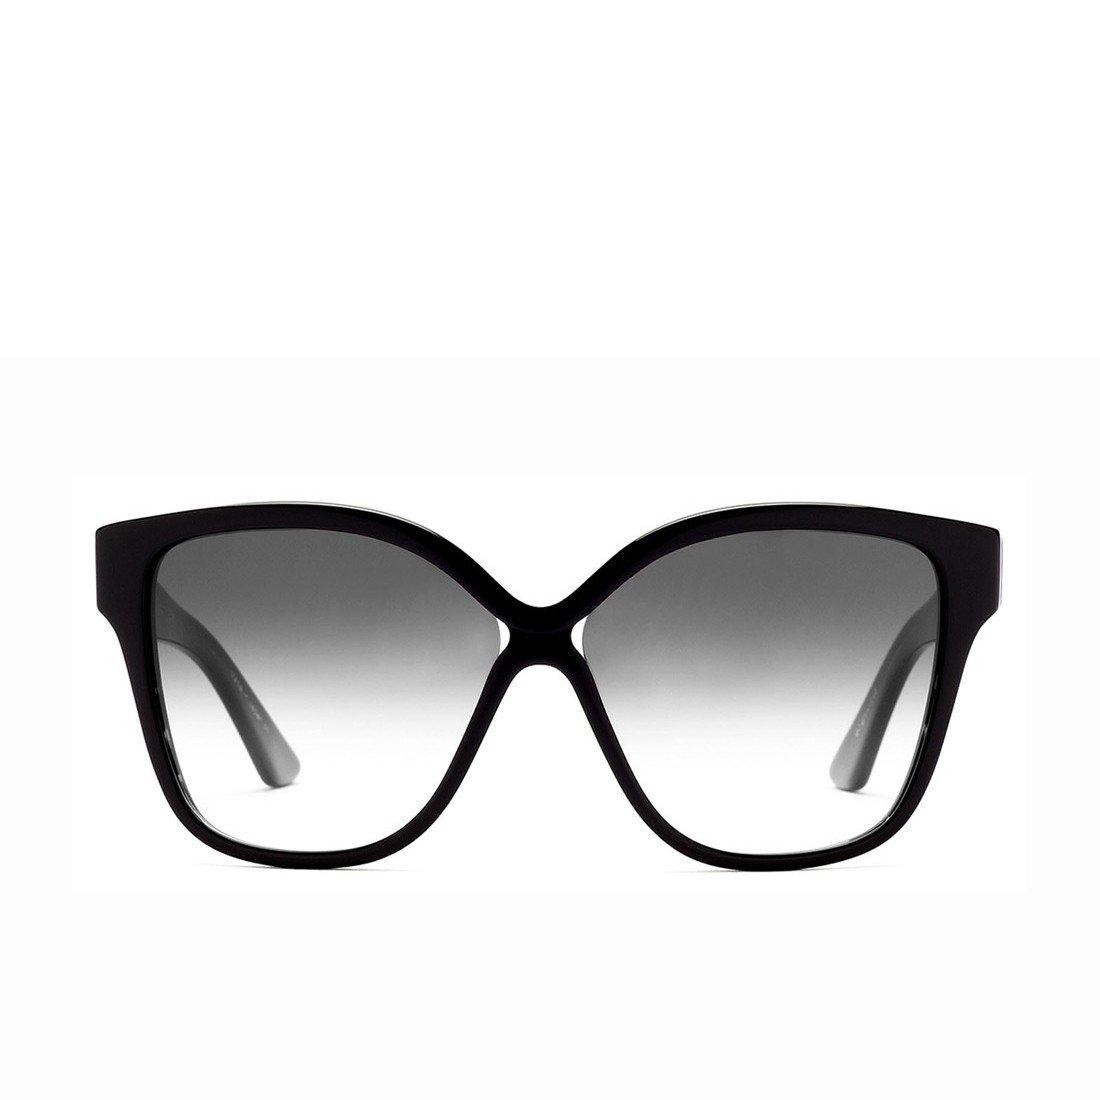 d44ef0fded2 Amazon.com  Dita Paradis 22016-A sunglasses Black gray gradient new   Clothing